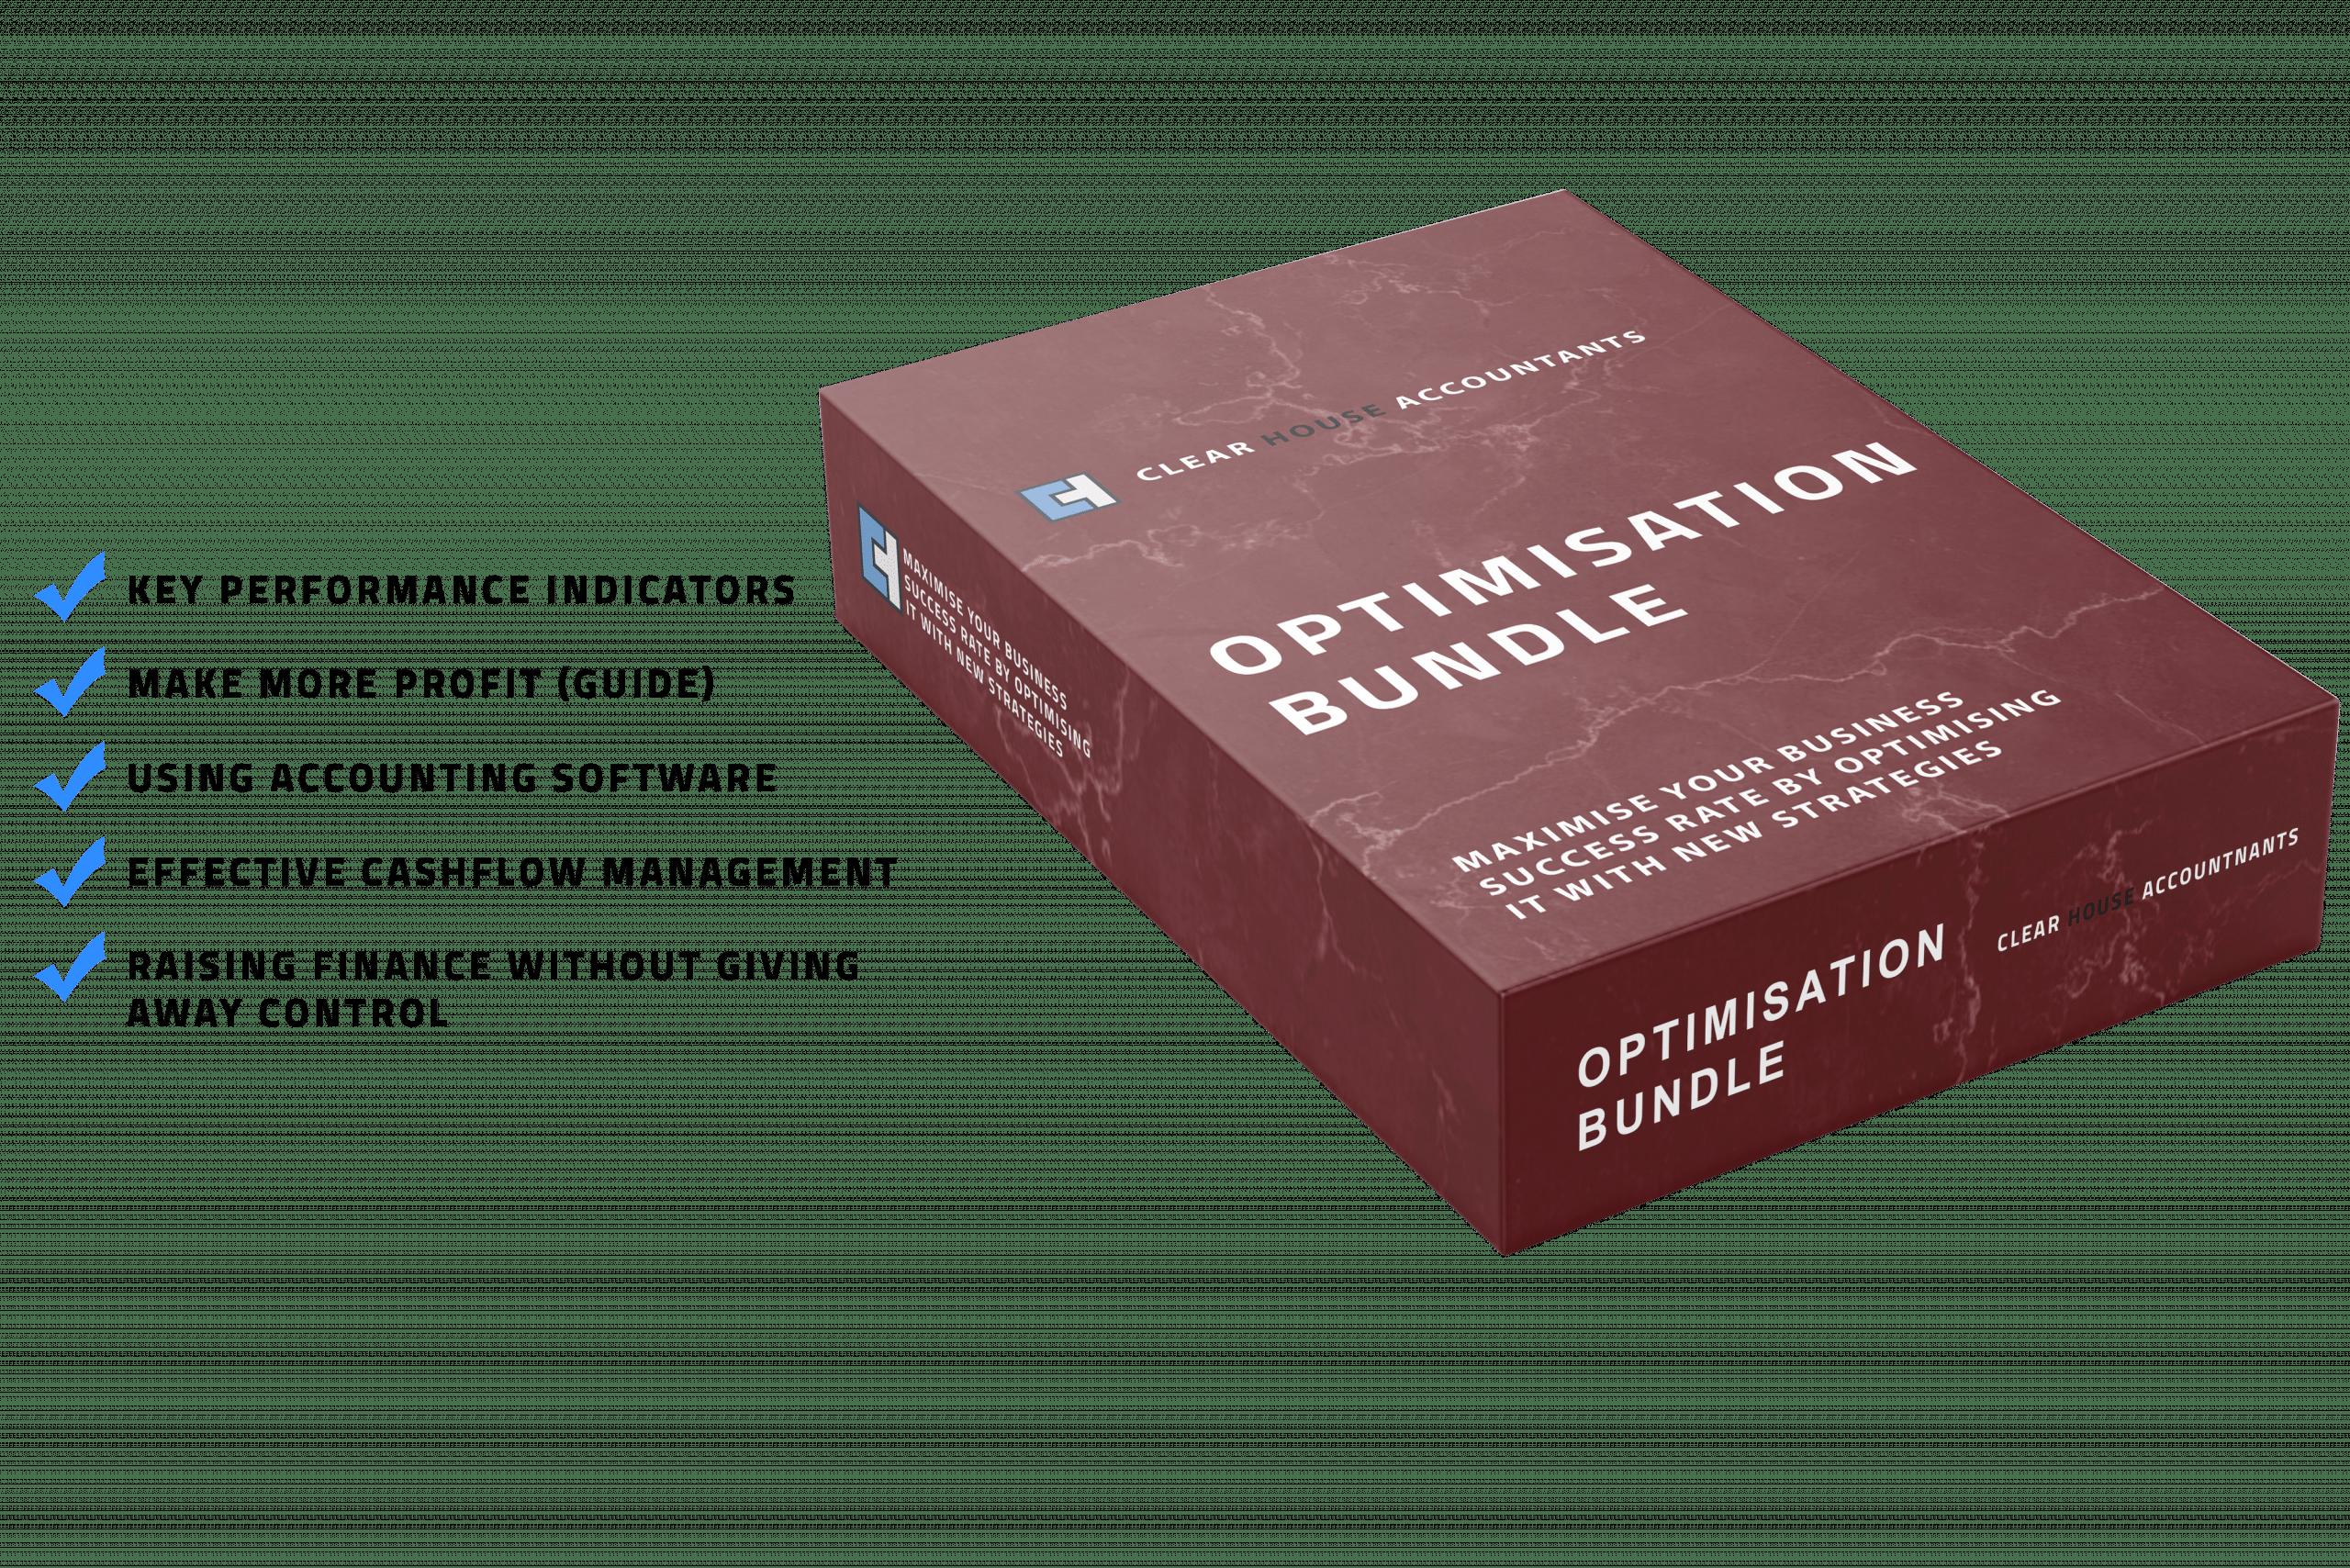 Optimisation Bundle